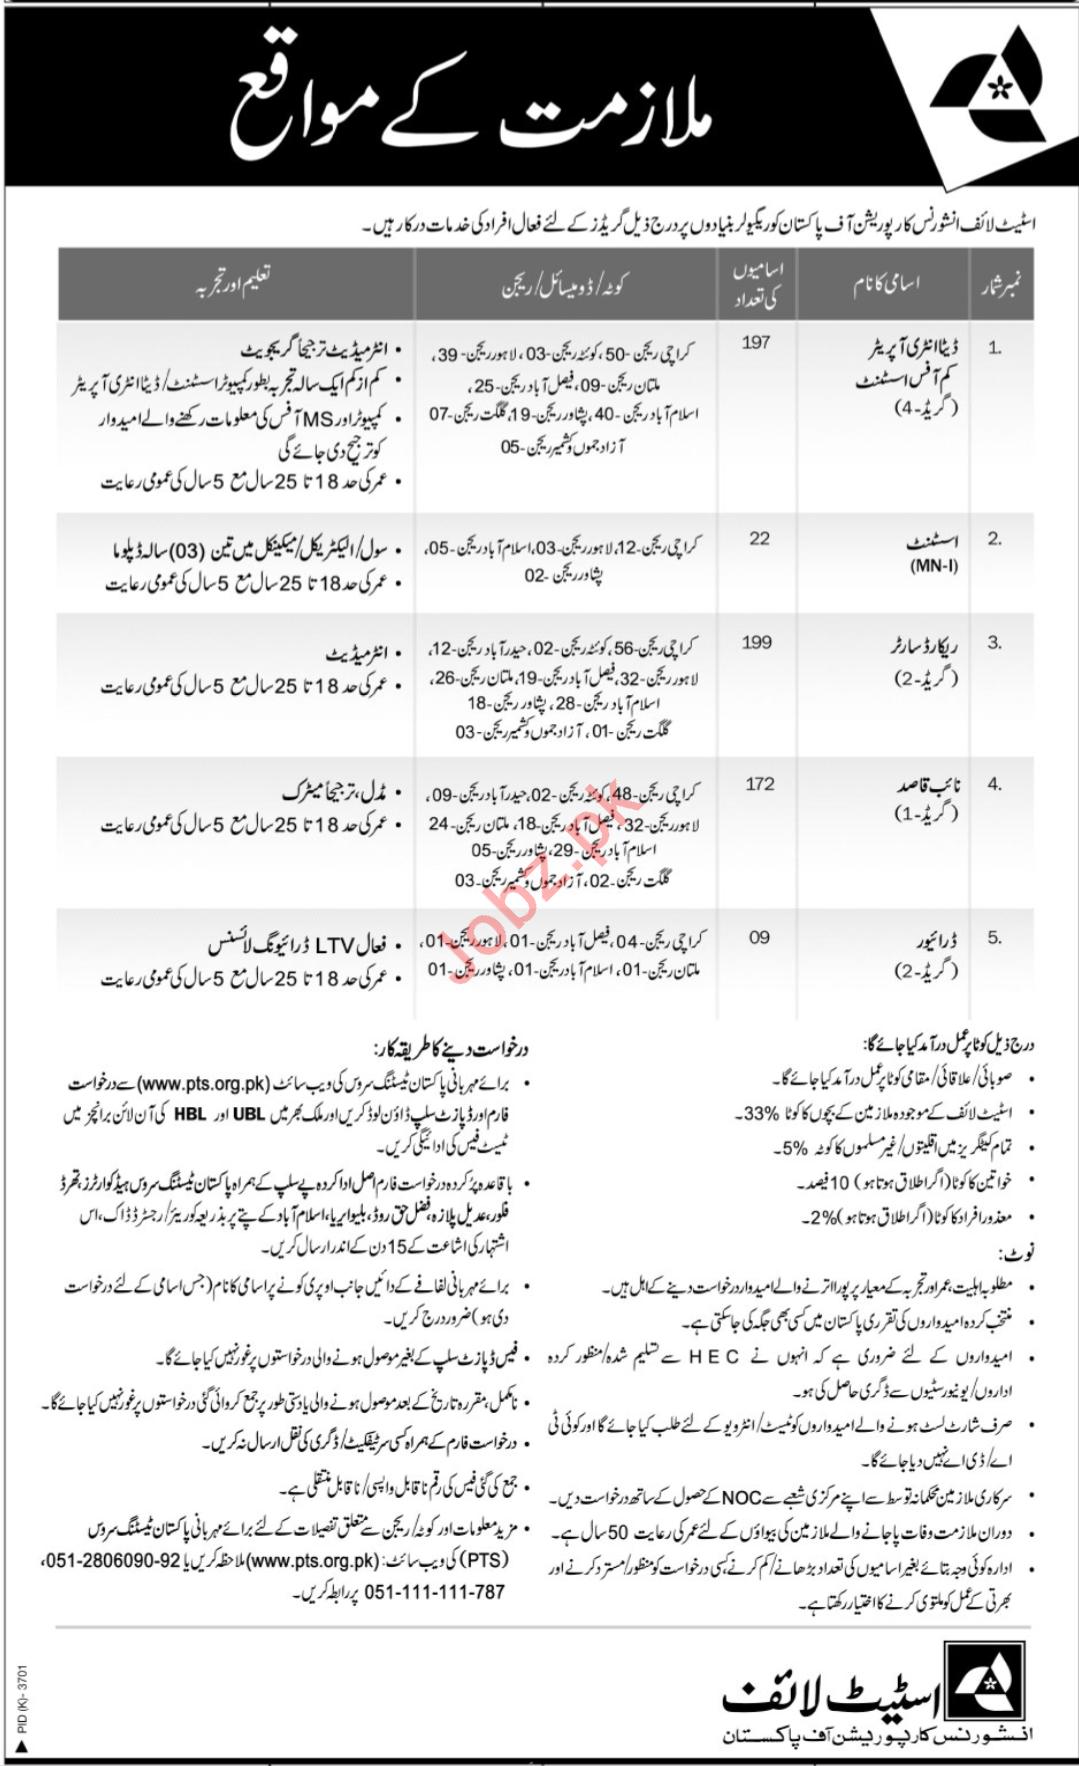 State Life Insurance Corporation of Pakistan Jobs via PTS